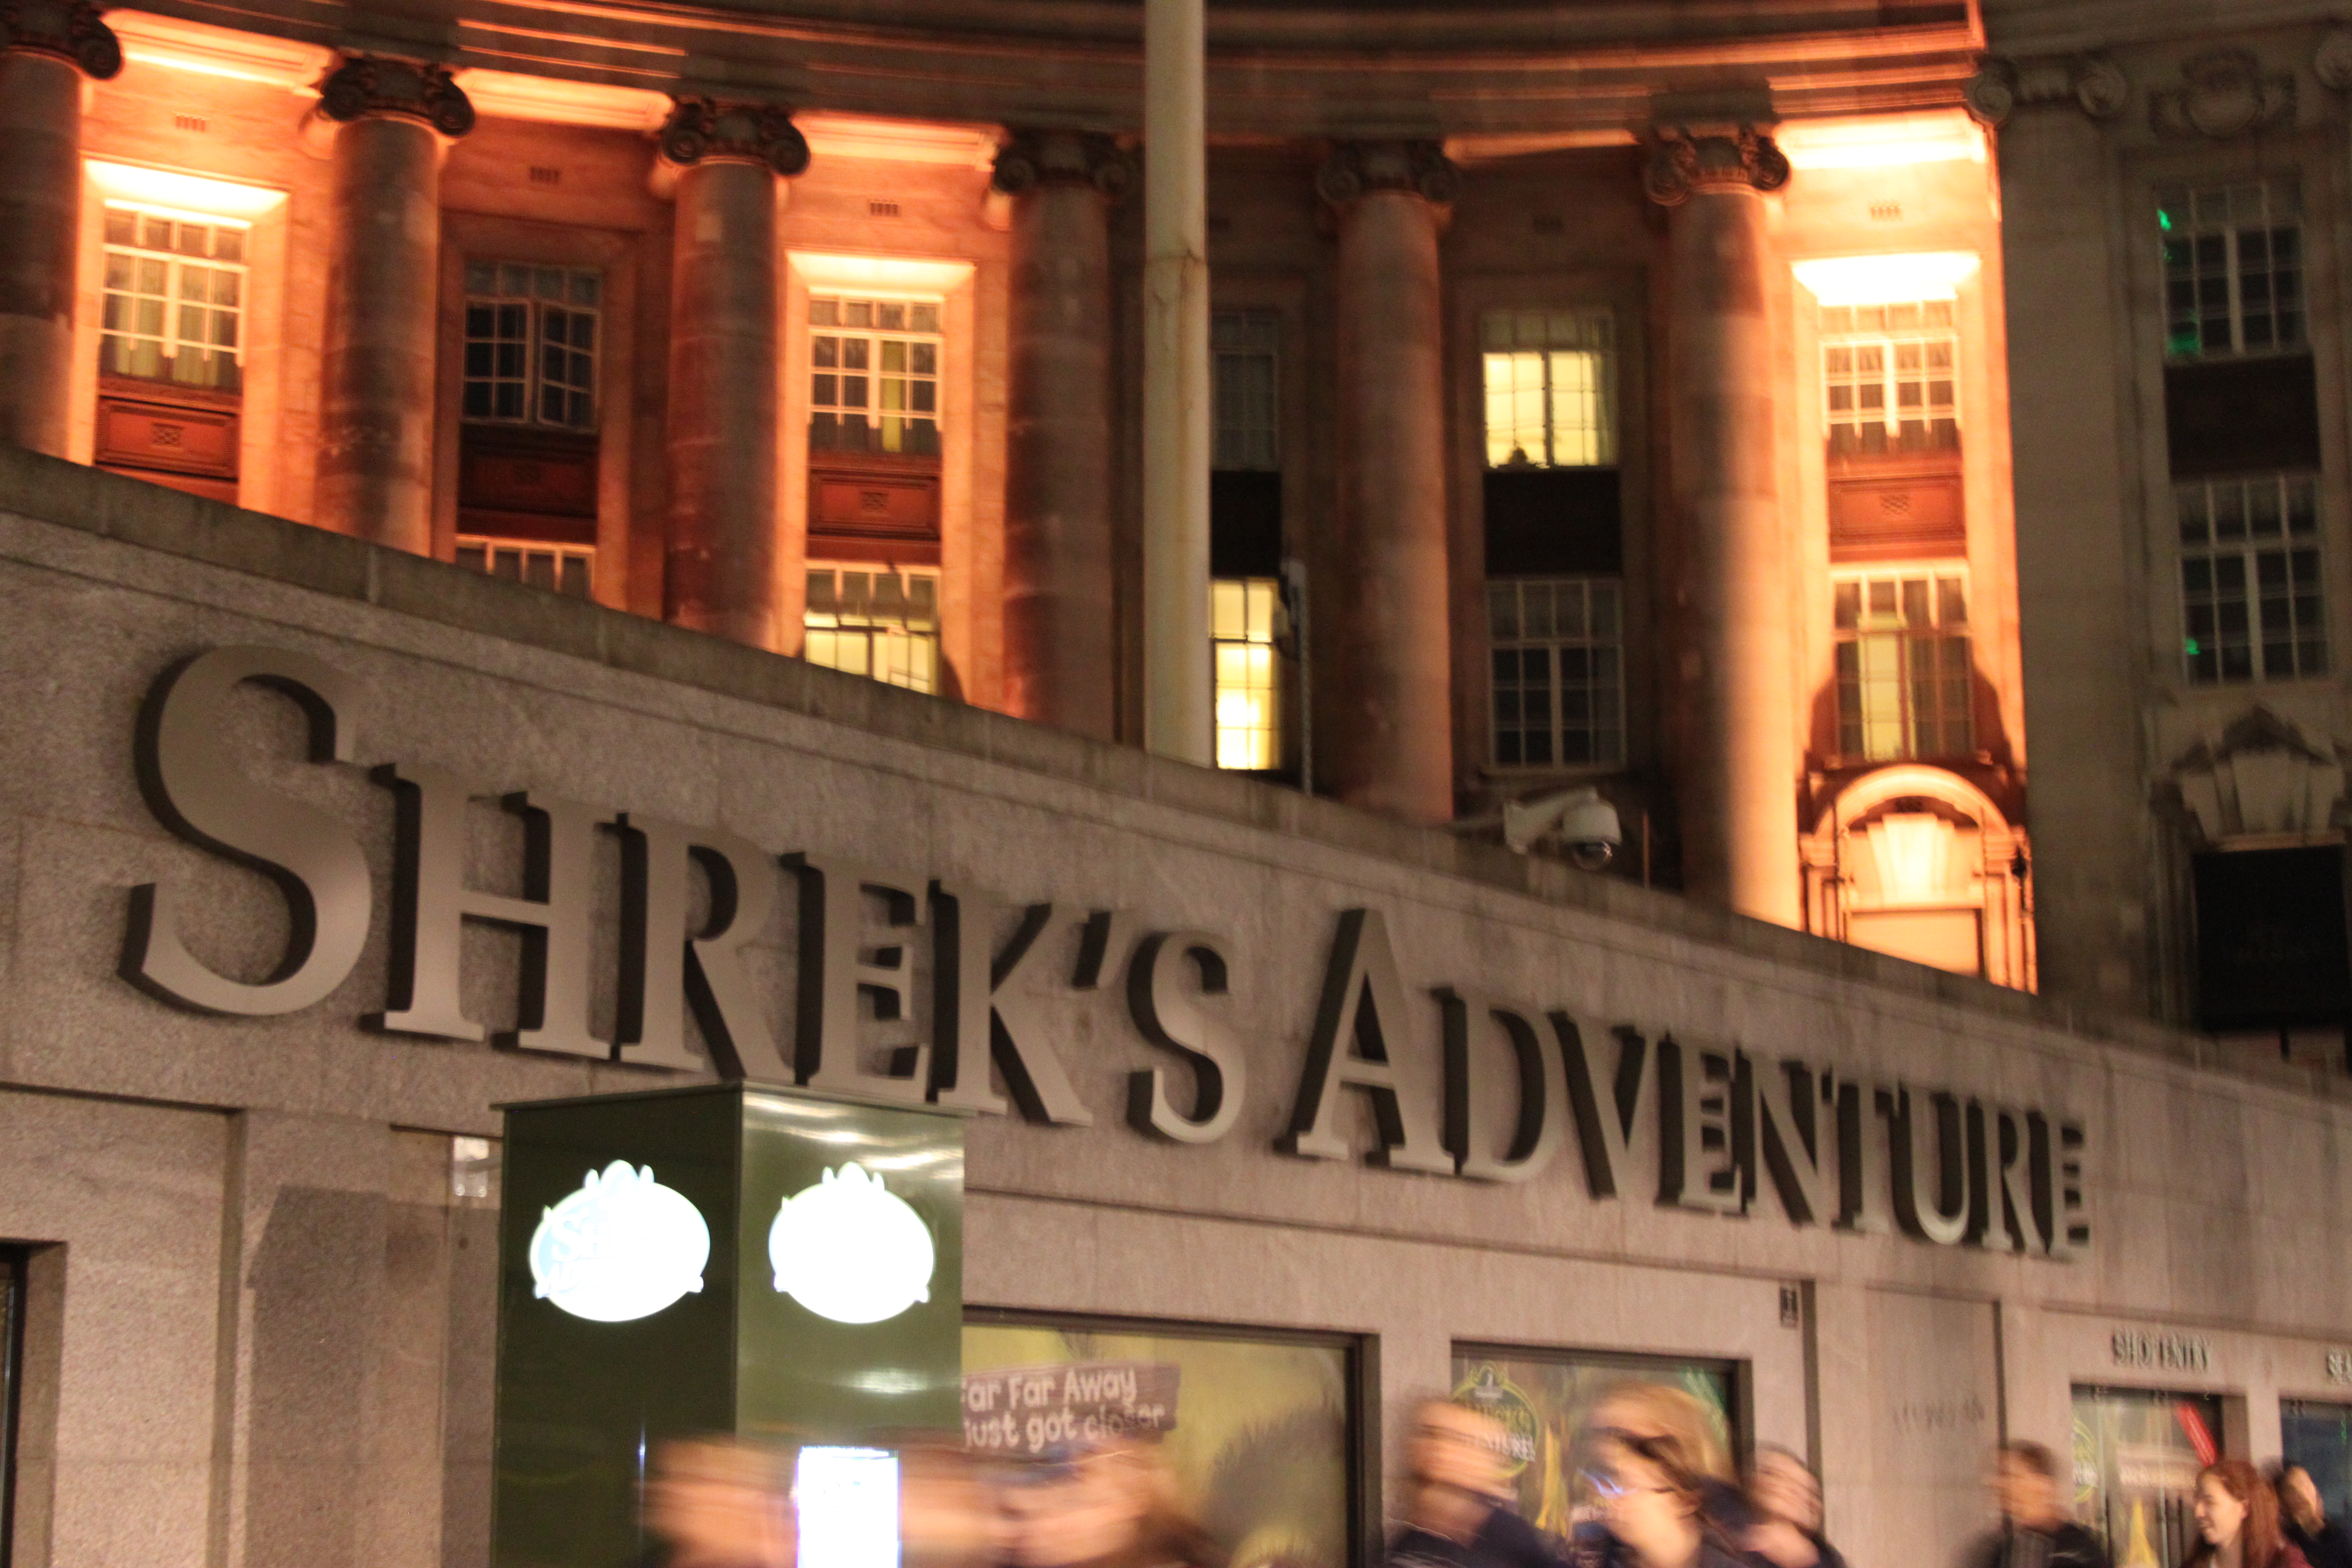 Shrek's Adventure Londra di #viaggiareapois